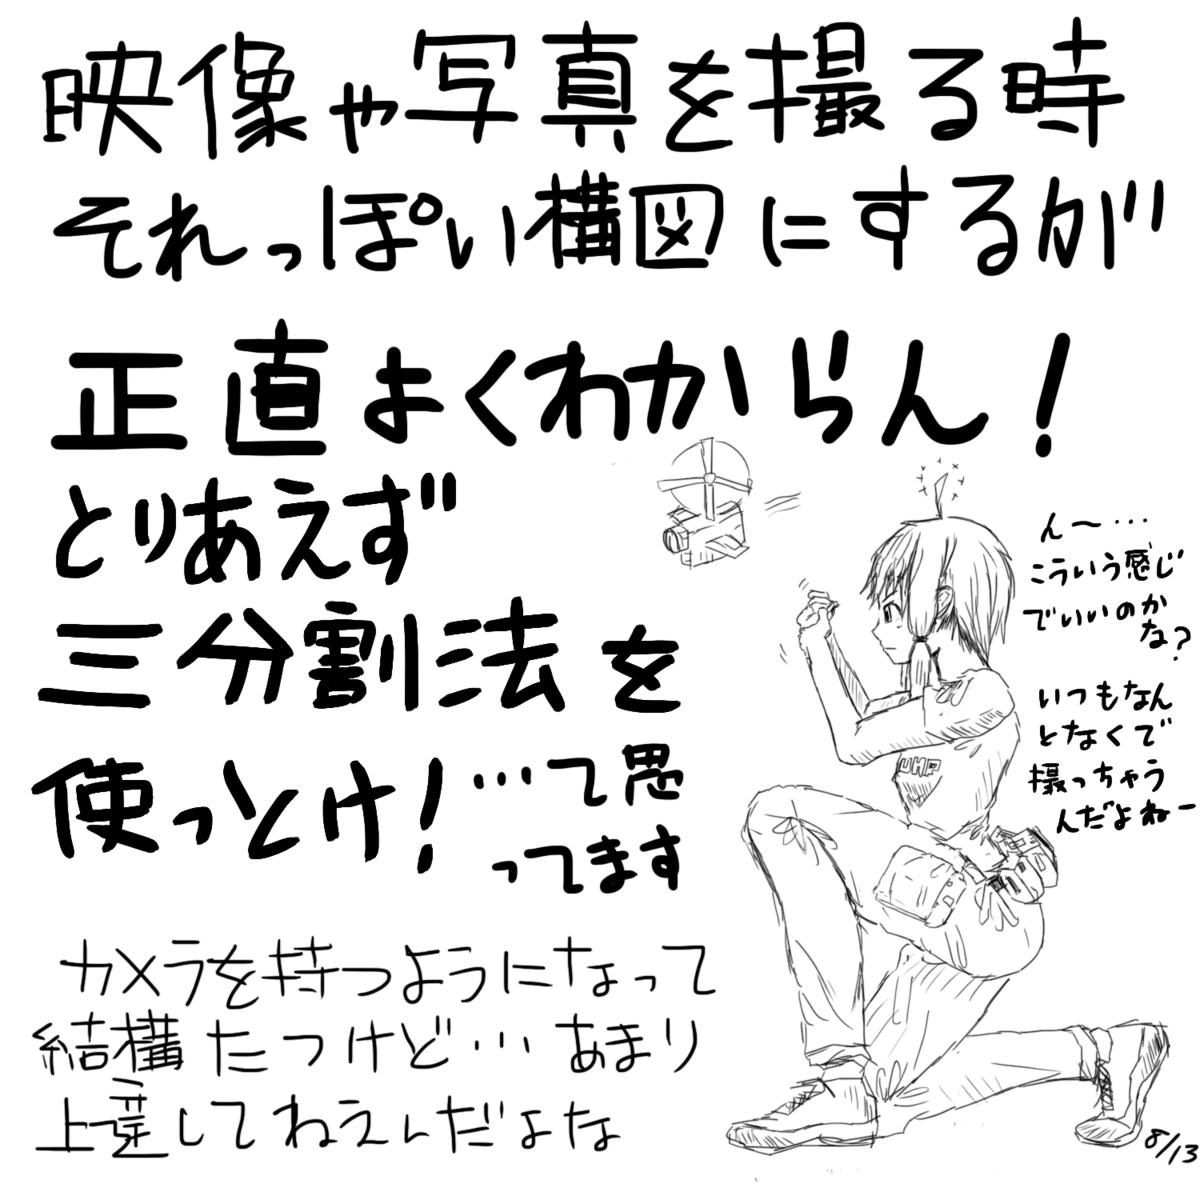 f:id:zomuzomu:20200813102719p:plain